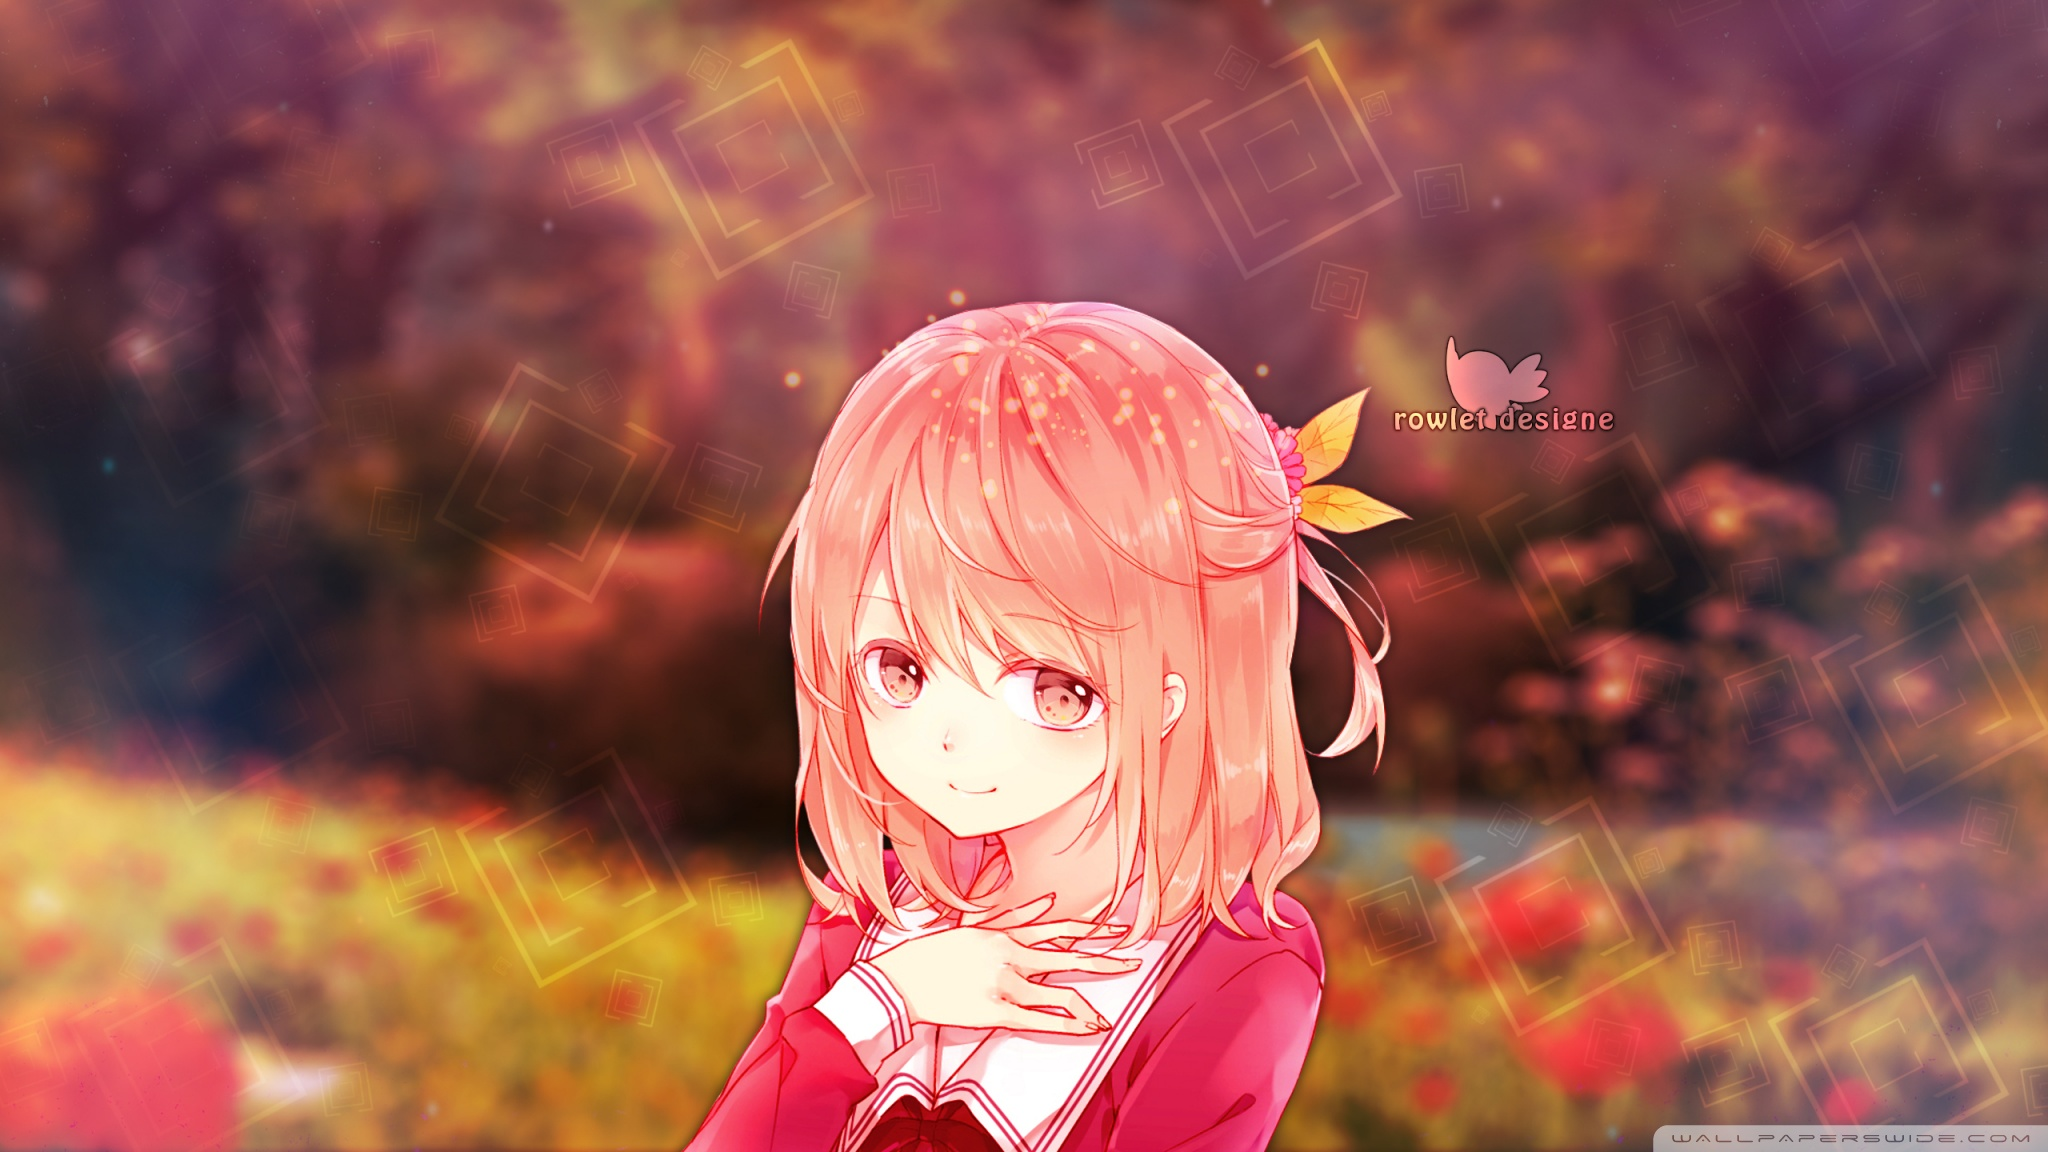 anime girl wallpaper,anime,cartoon,cg artwork,pink,sky